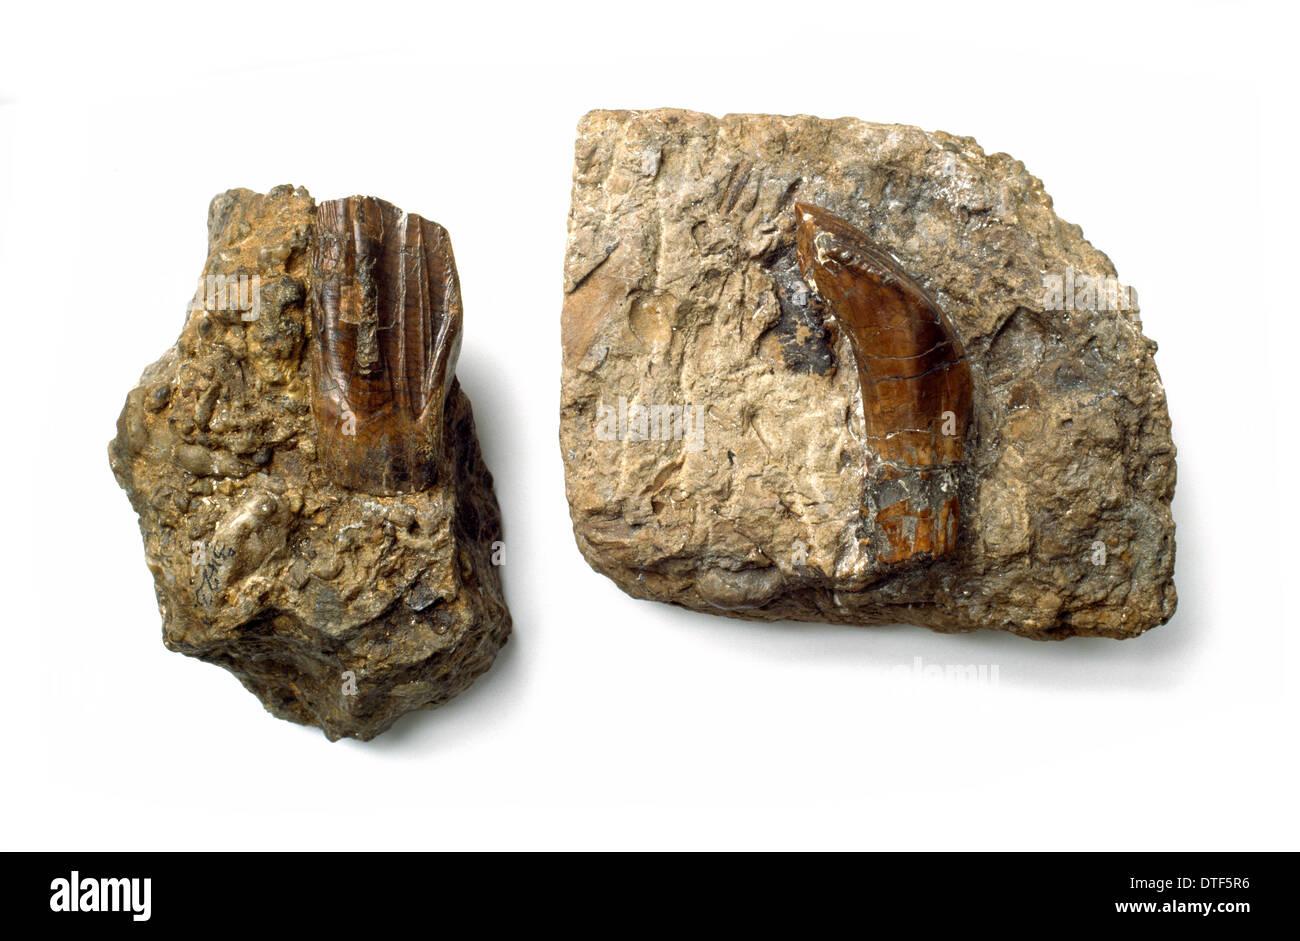 Iguanodon teeth - Stock Image